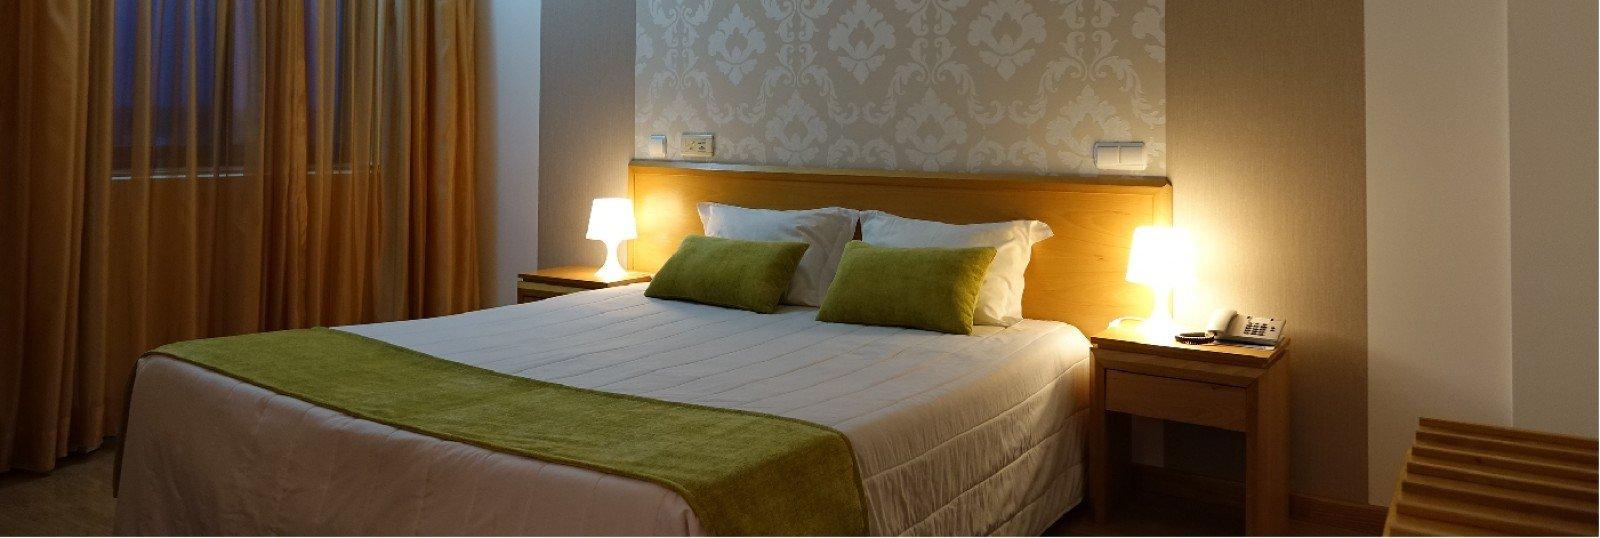 Hotel Eurosol Alcanena - quarto duplo